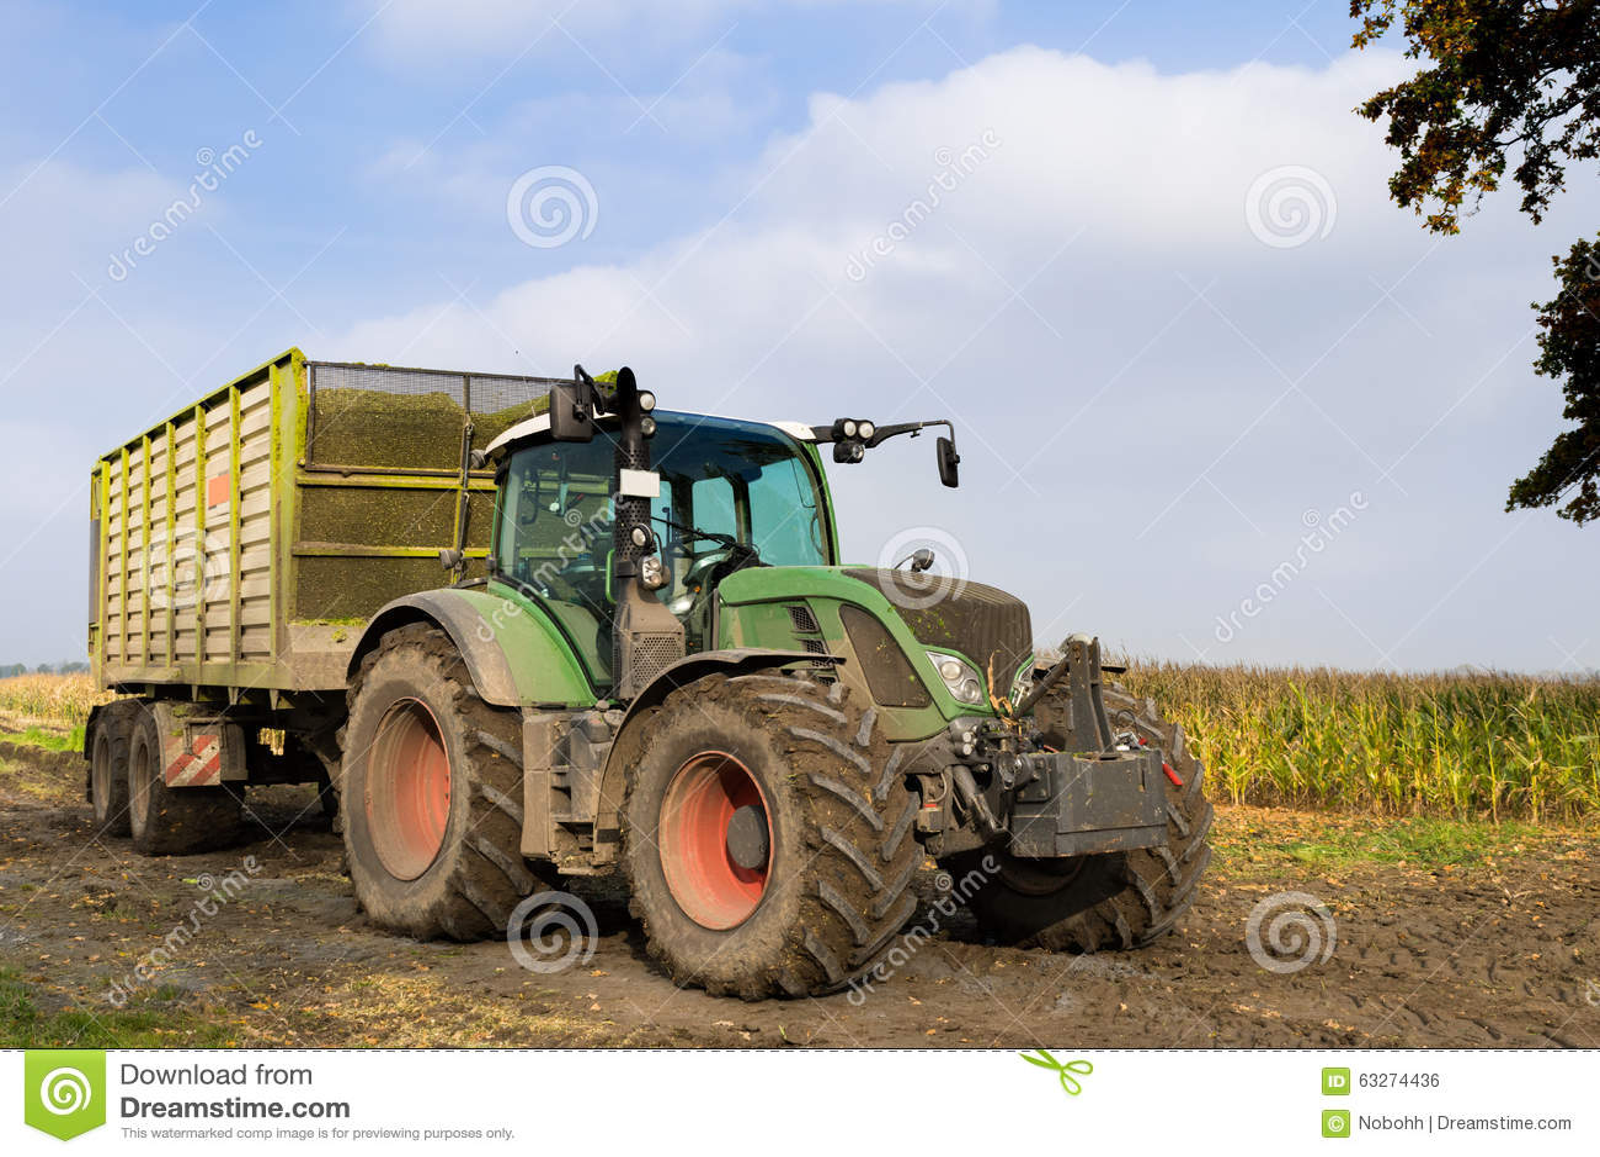 Cartoon Tractor Corn Picker : Combine harvester during canola harvest royalty free stock